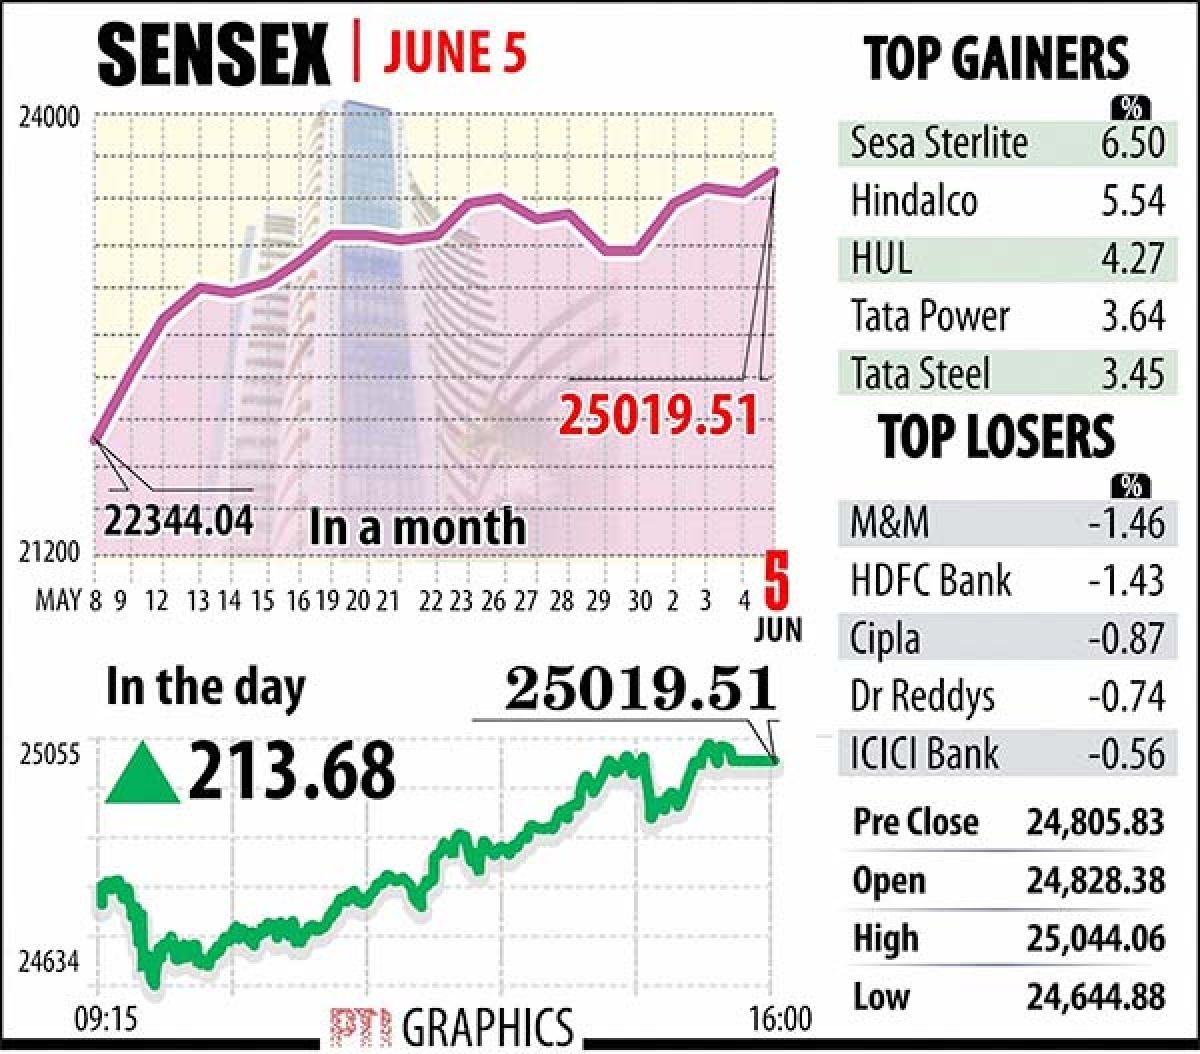 Sensex ends above 25k on  gains in oil, metal stocks